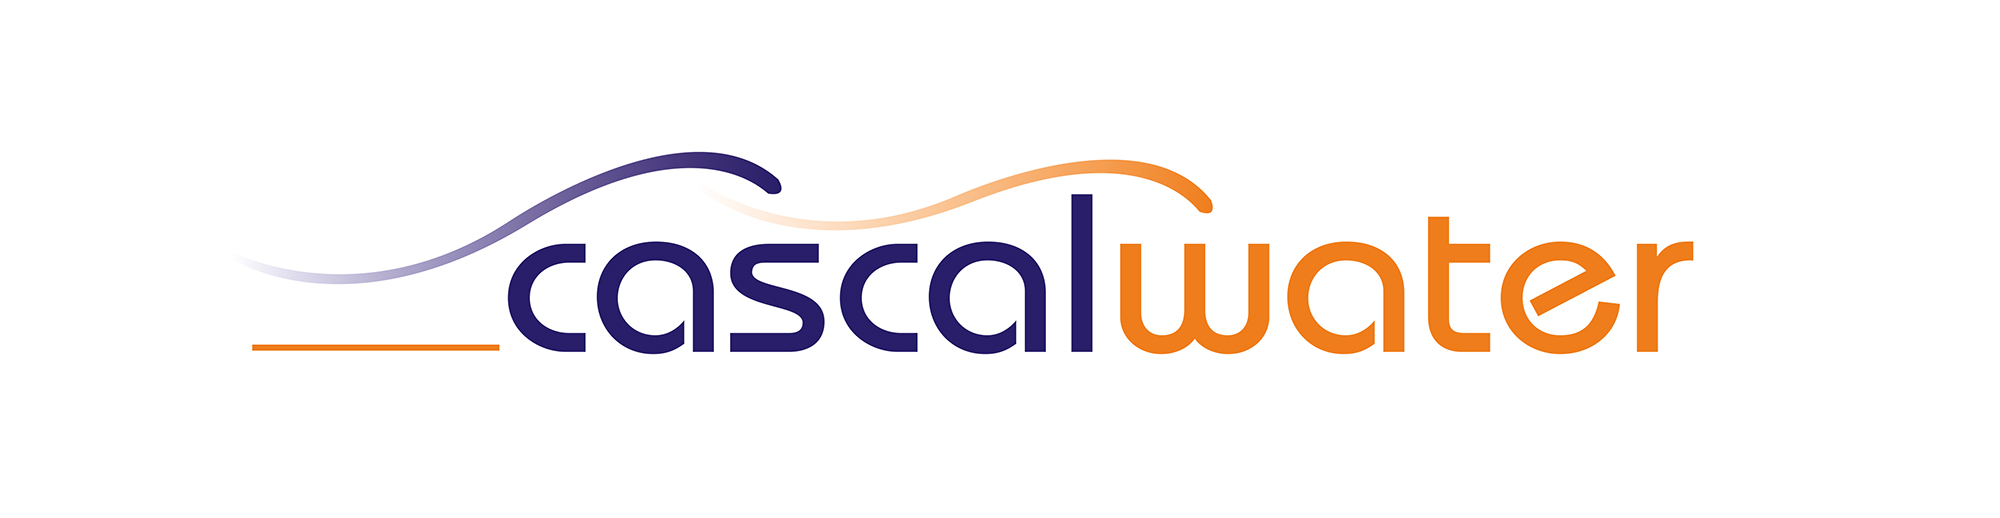 Cascal Water Logo